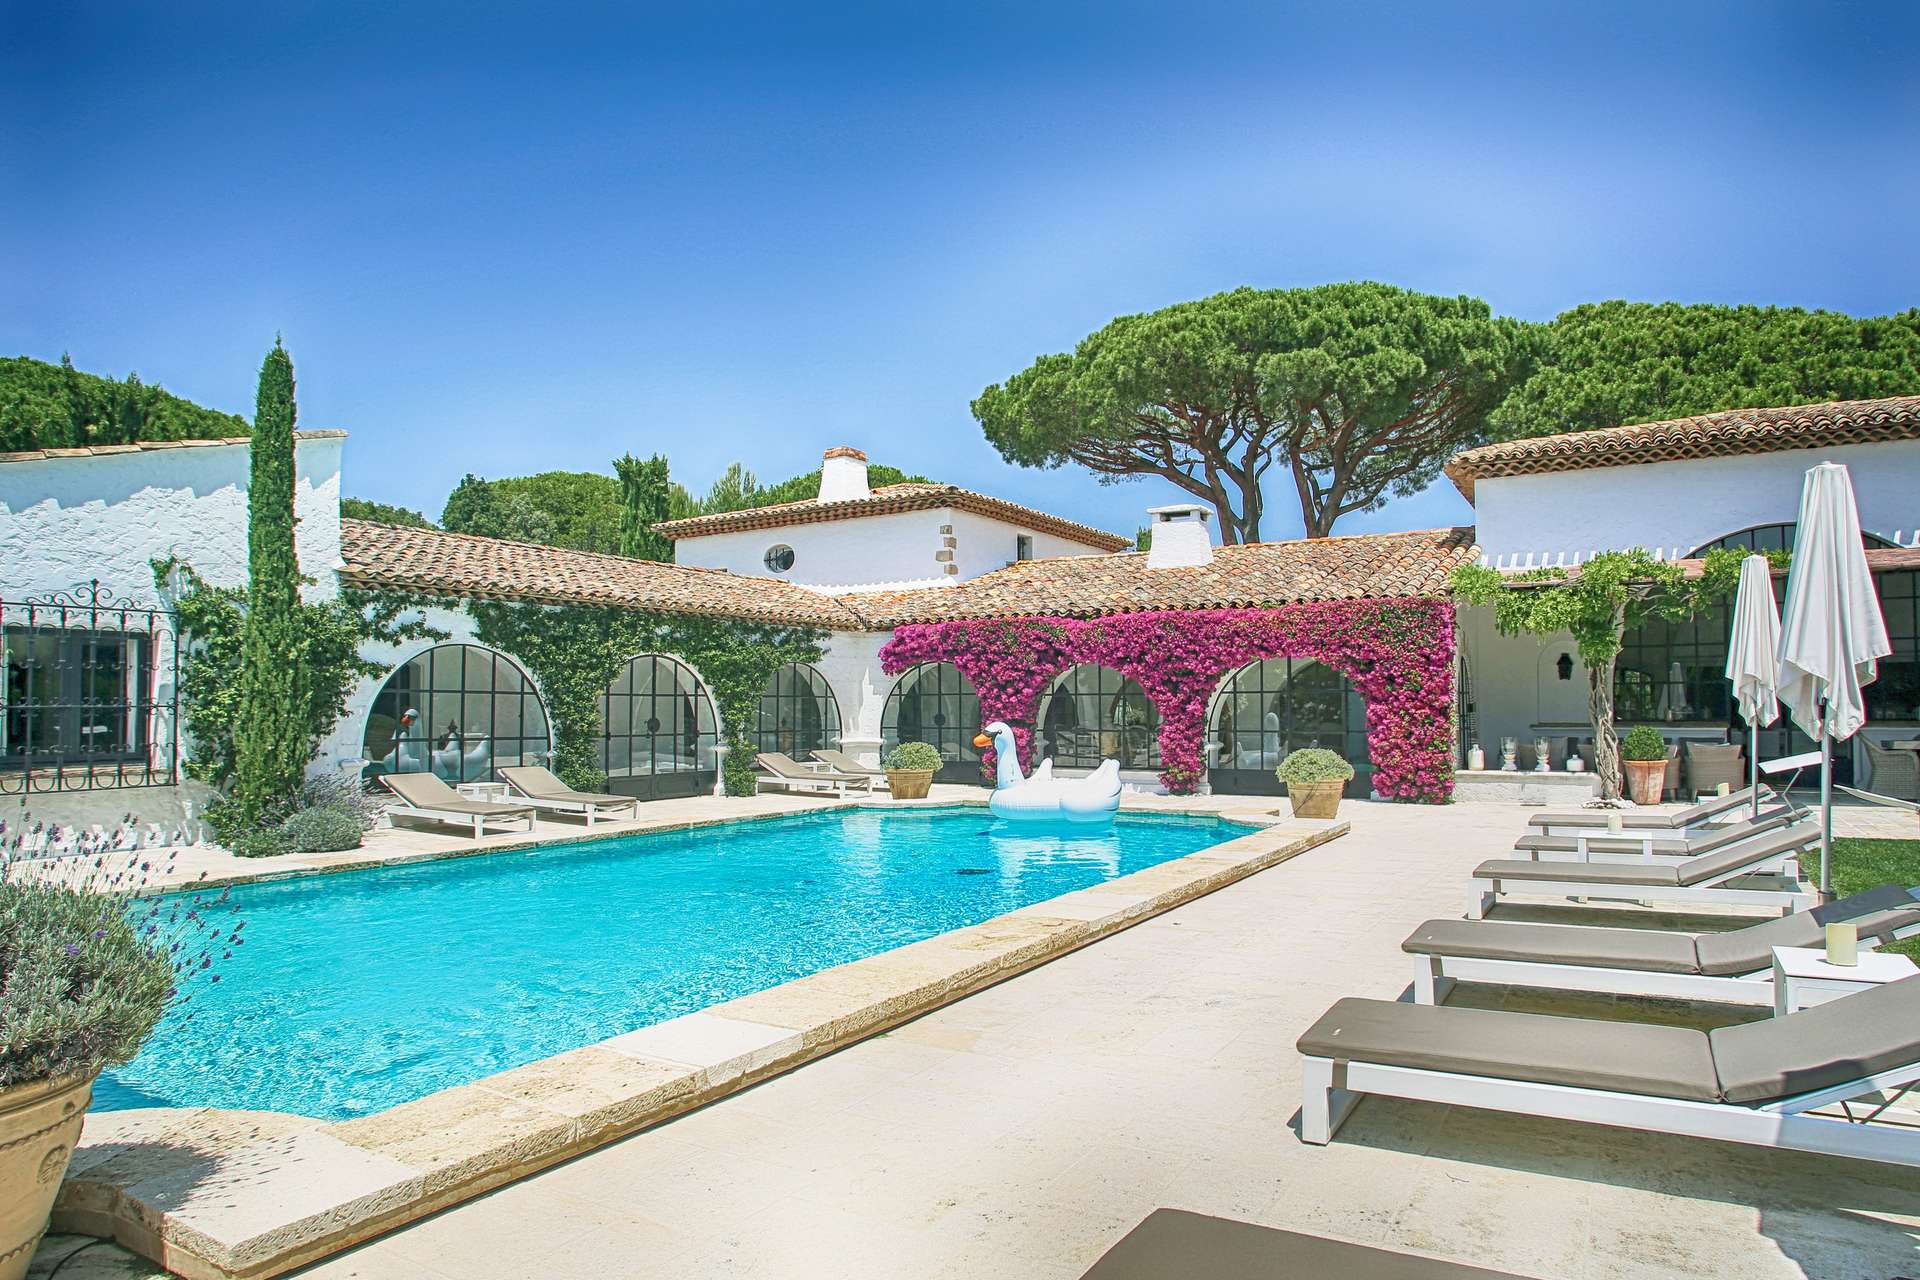 Luxury vacation rentals europe - France - Frenchriviera - Saint tropez - Villa des Parcs - Image 1/23